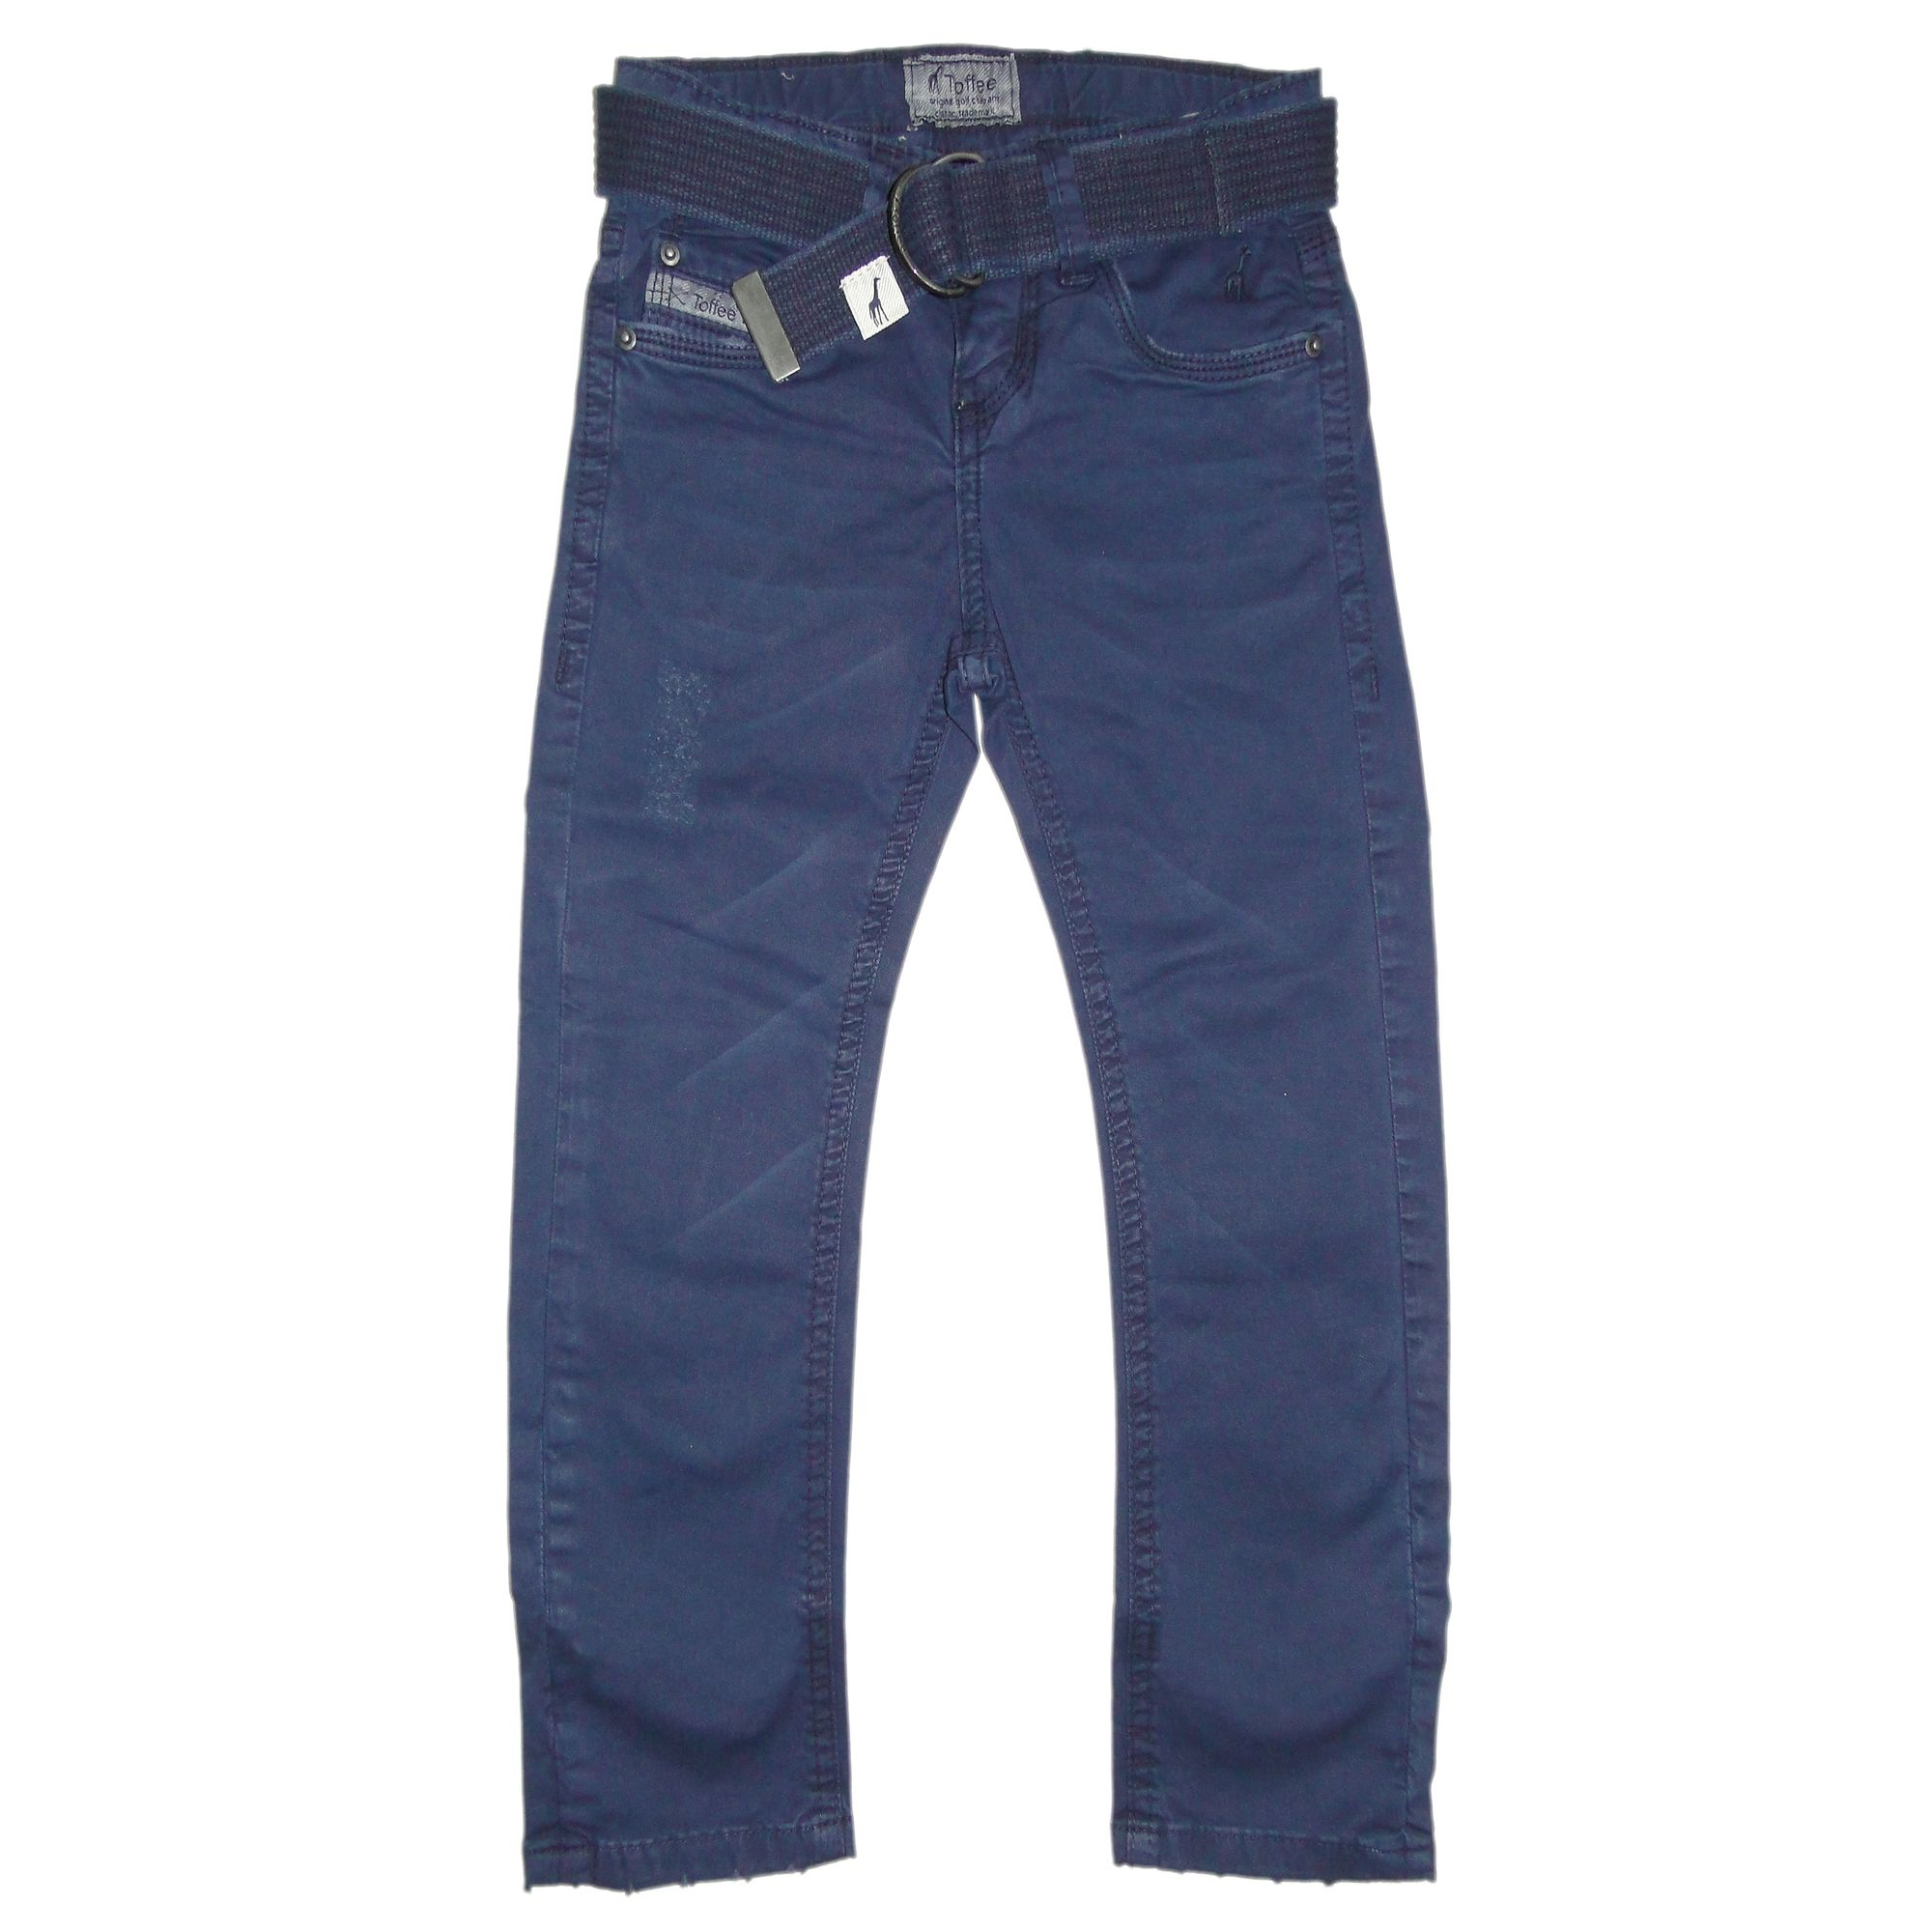 calca-infantil-sarja-azul-marinho-toffee-inverno